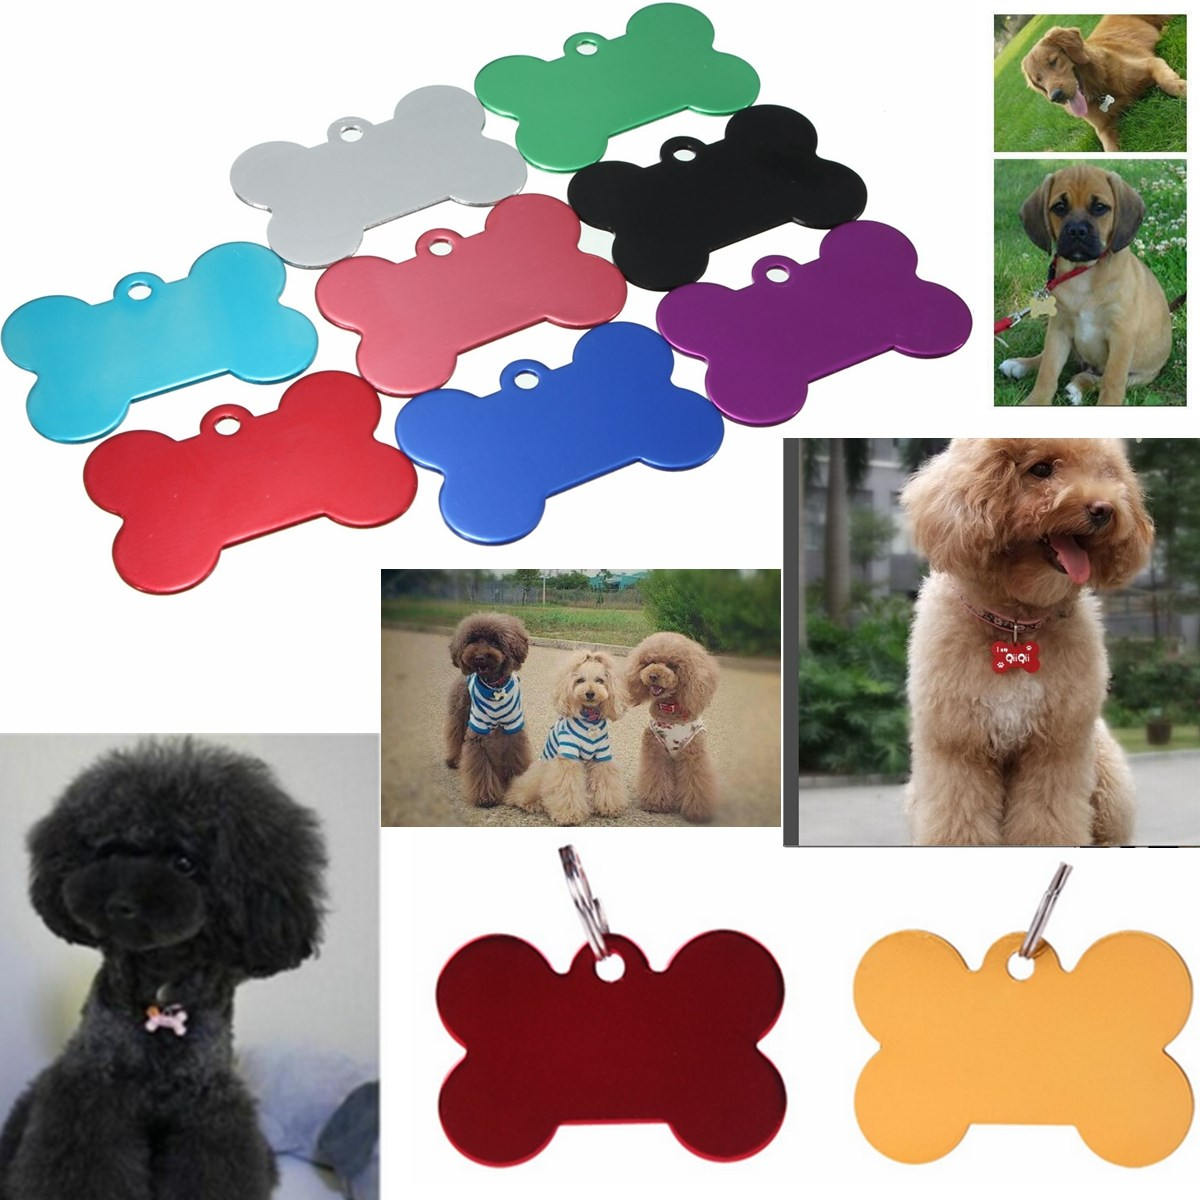 2pcs/Lot Pet Tag Identification Dog Tag The Name Blank Pet ID Tags Dog Cat Animal Name Charm Tag Metal(China (Mainland))